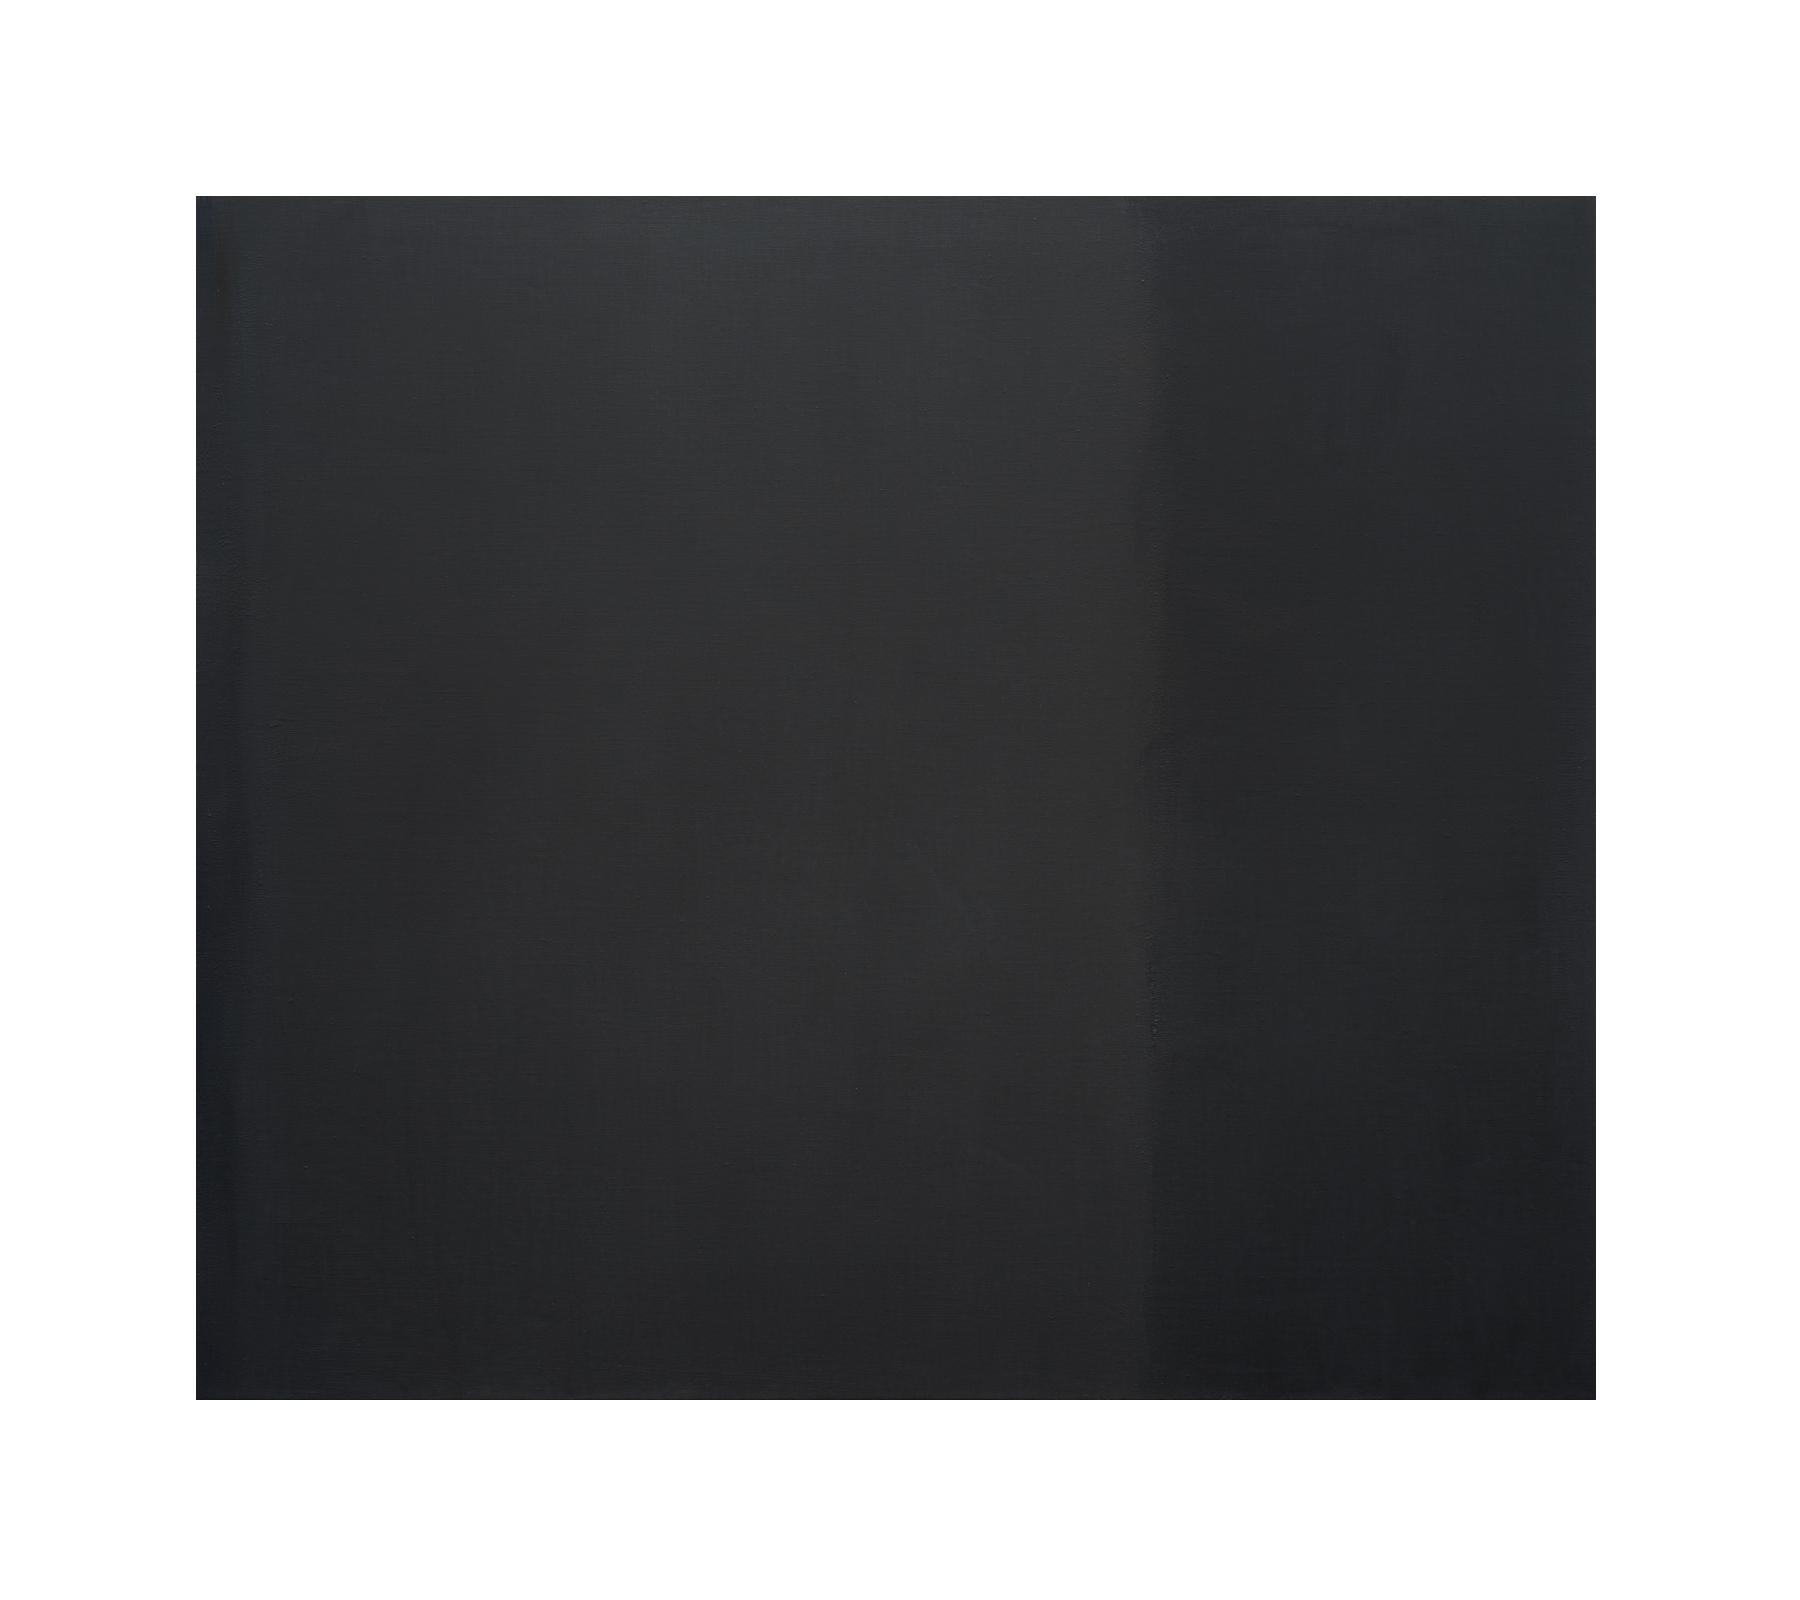 Untitled 2018 130x150cm